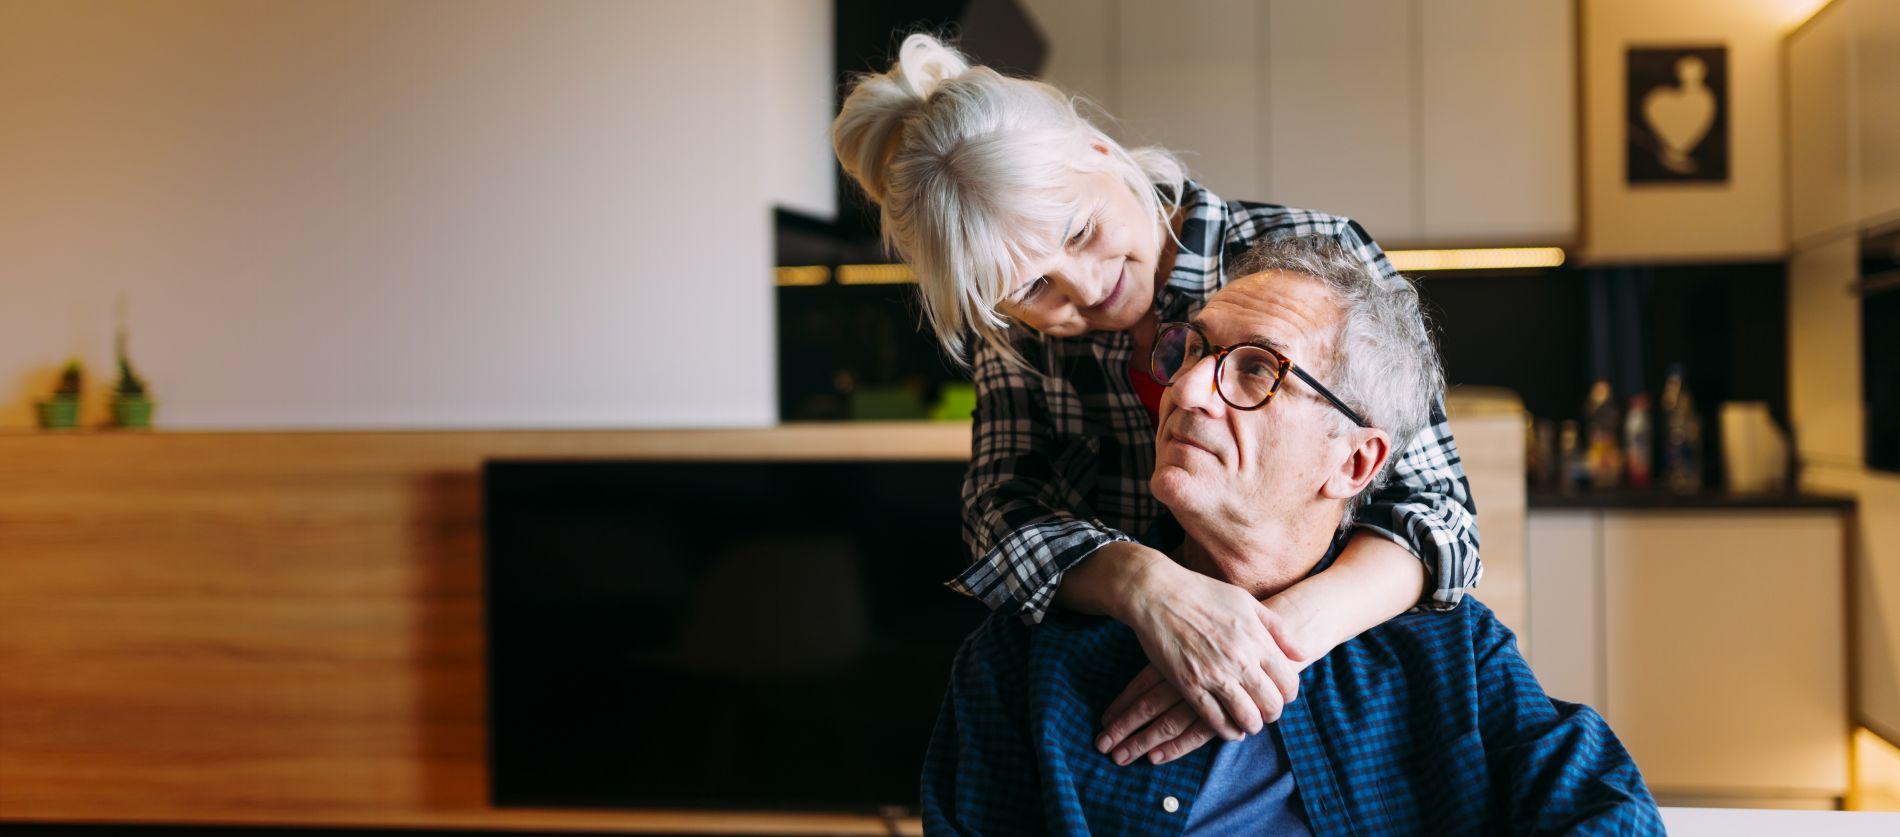 Кредит под залог без отказа пенсионерам на недвижимость